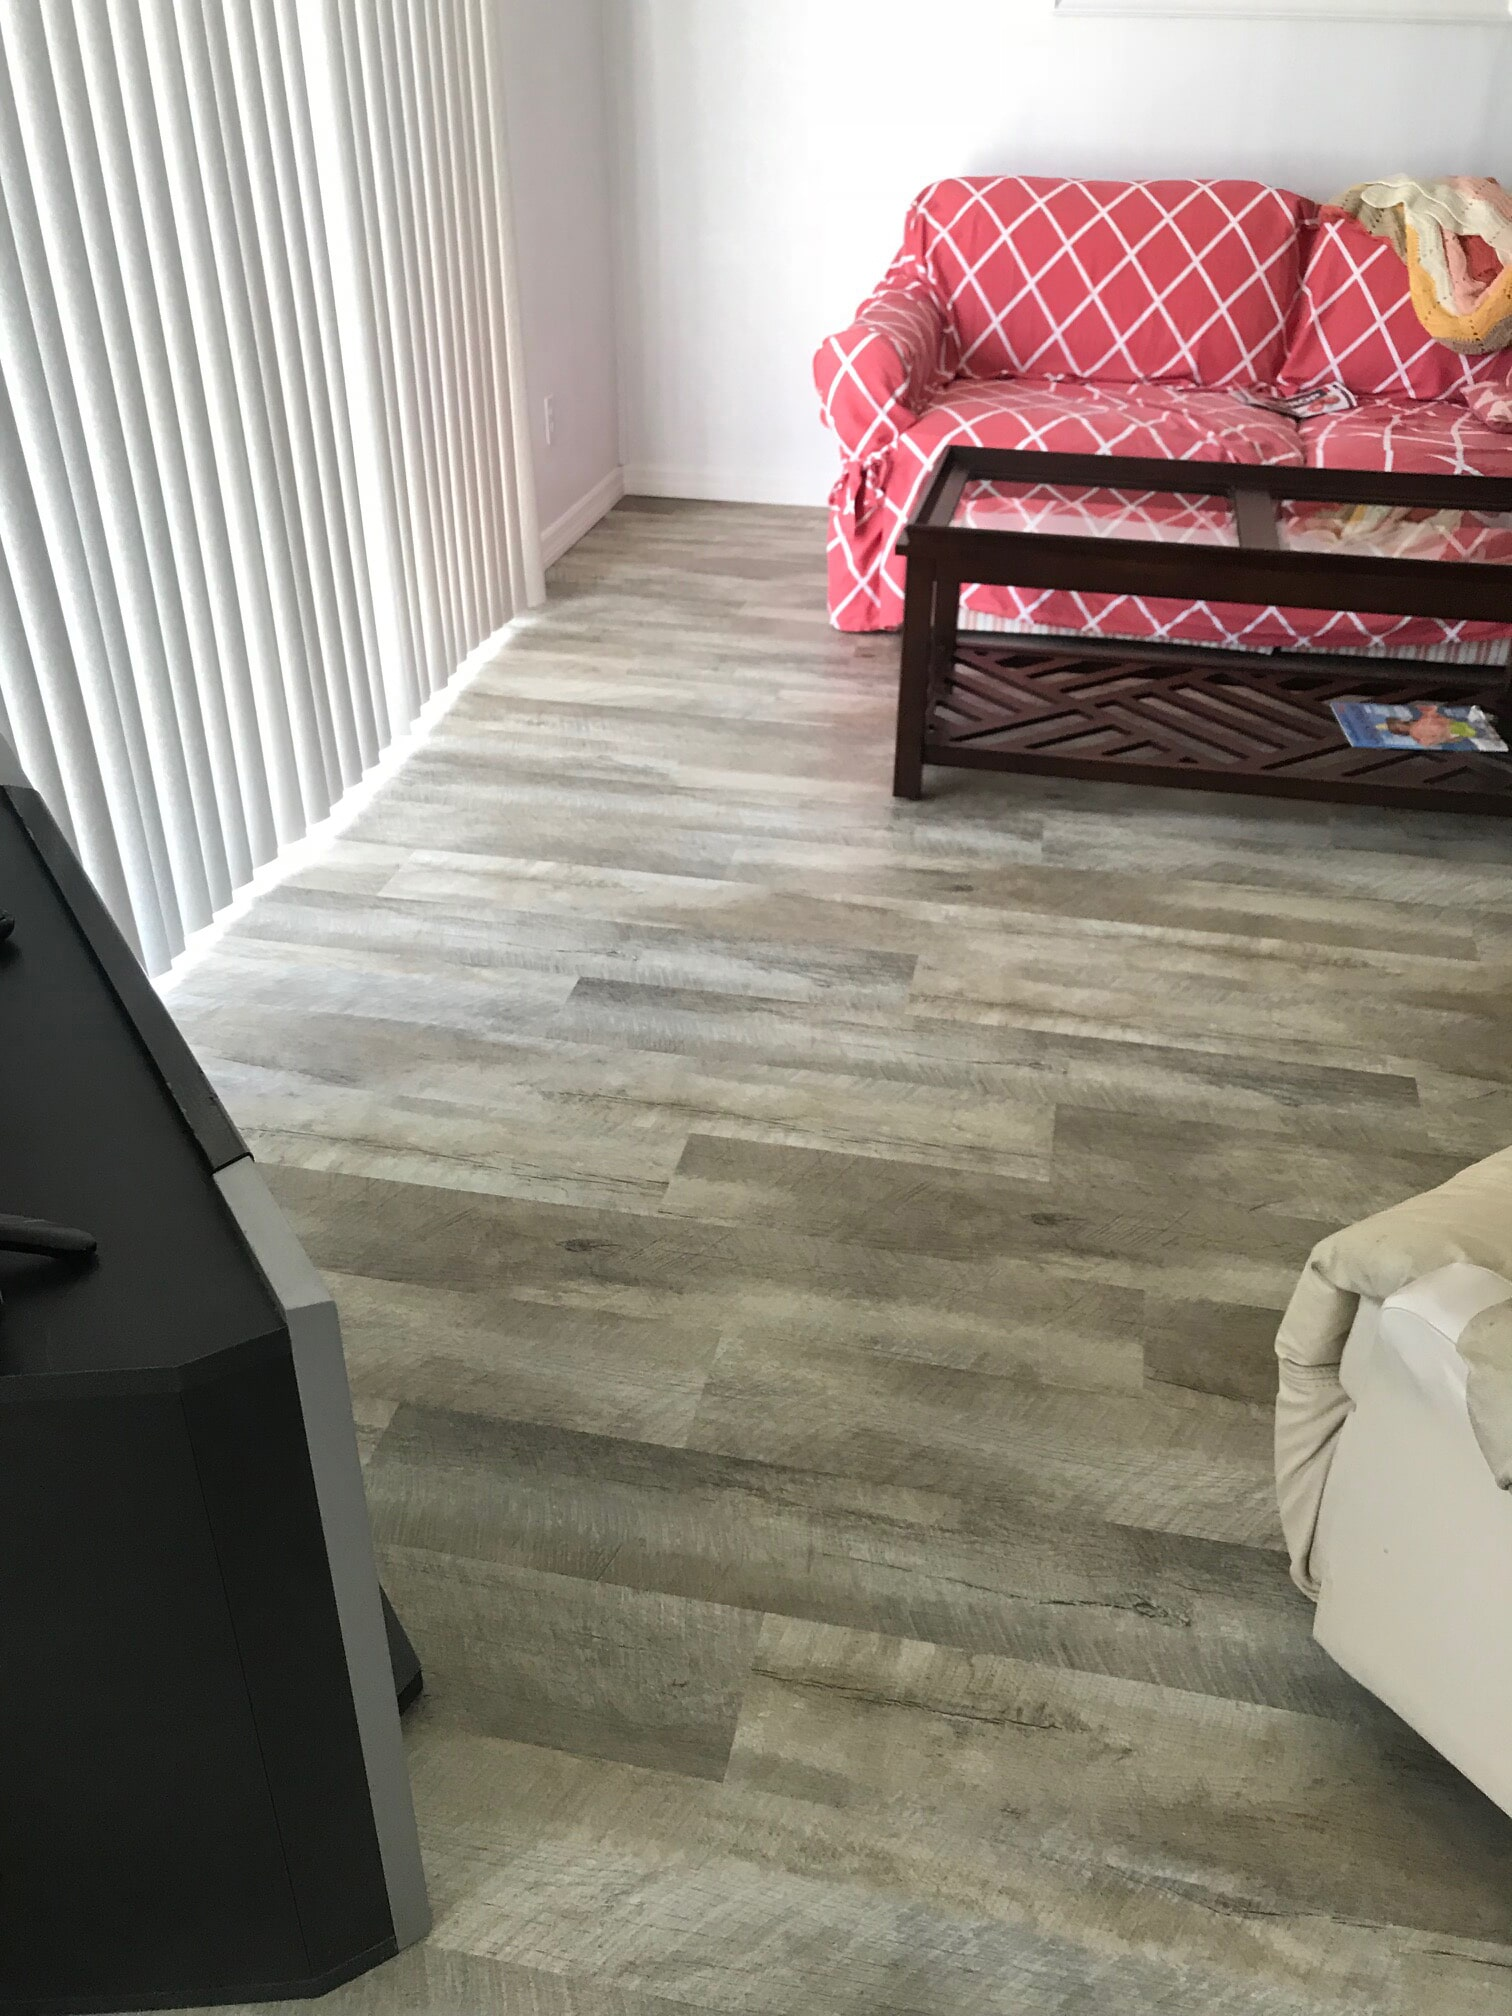 Luxury vinyl plank flooring from The Flooring Center in Windermere, FL